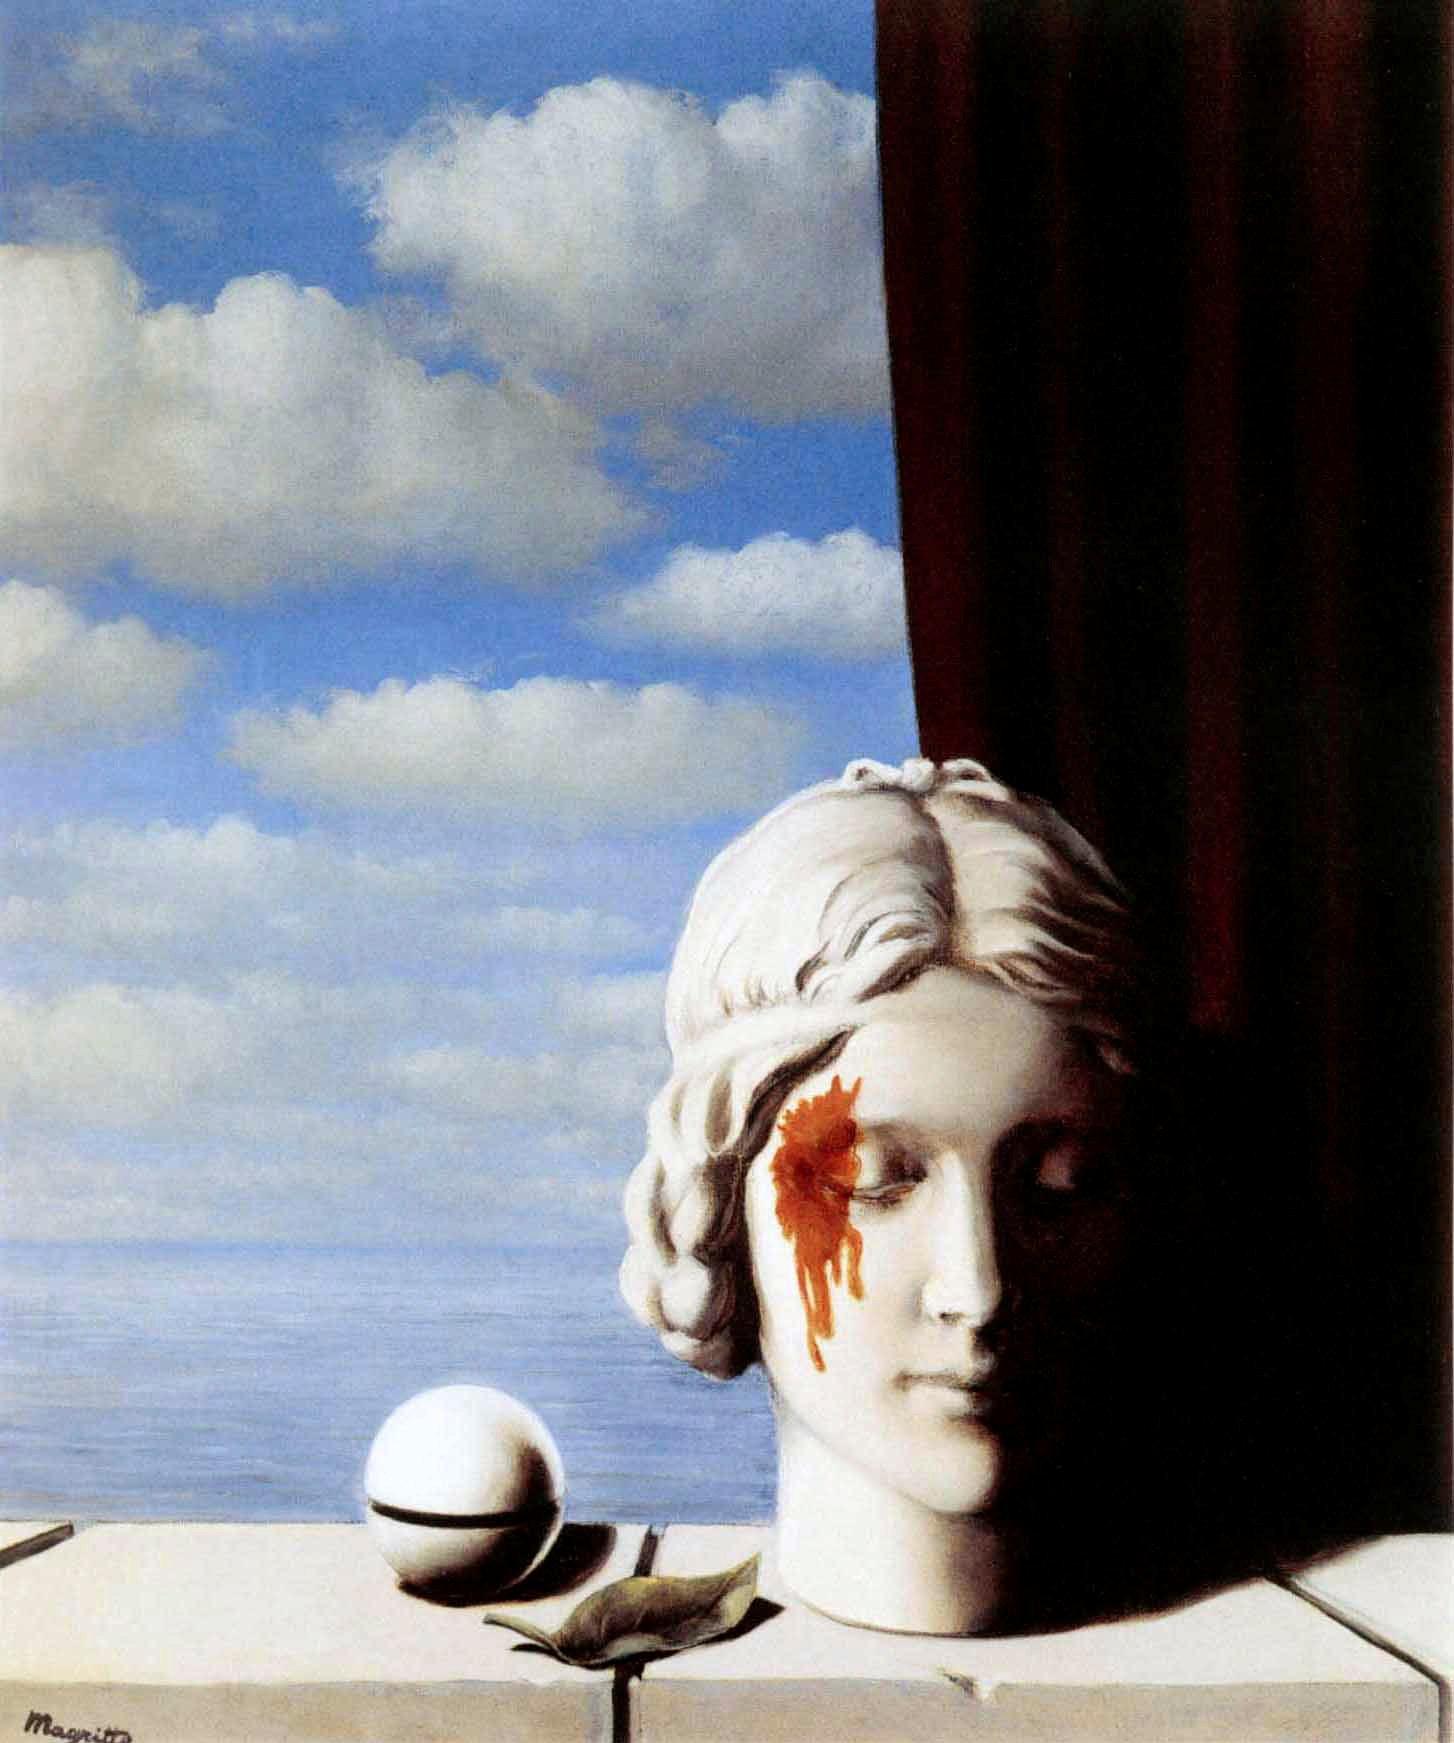 La Memoire (Память), Рене Магритт, художники, сюрреализм